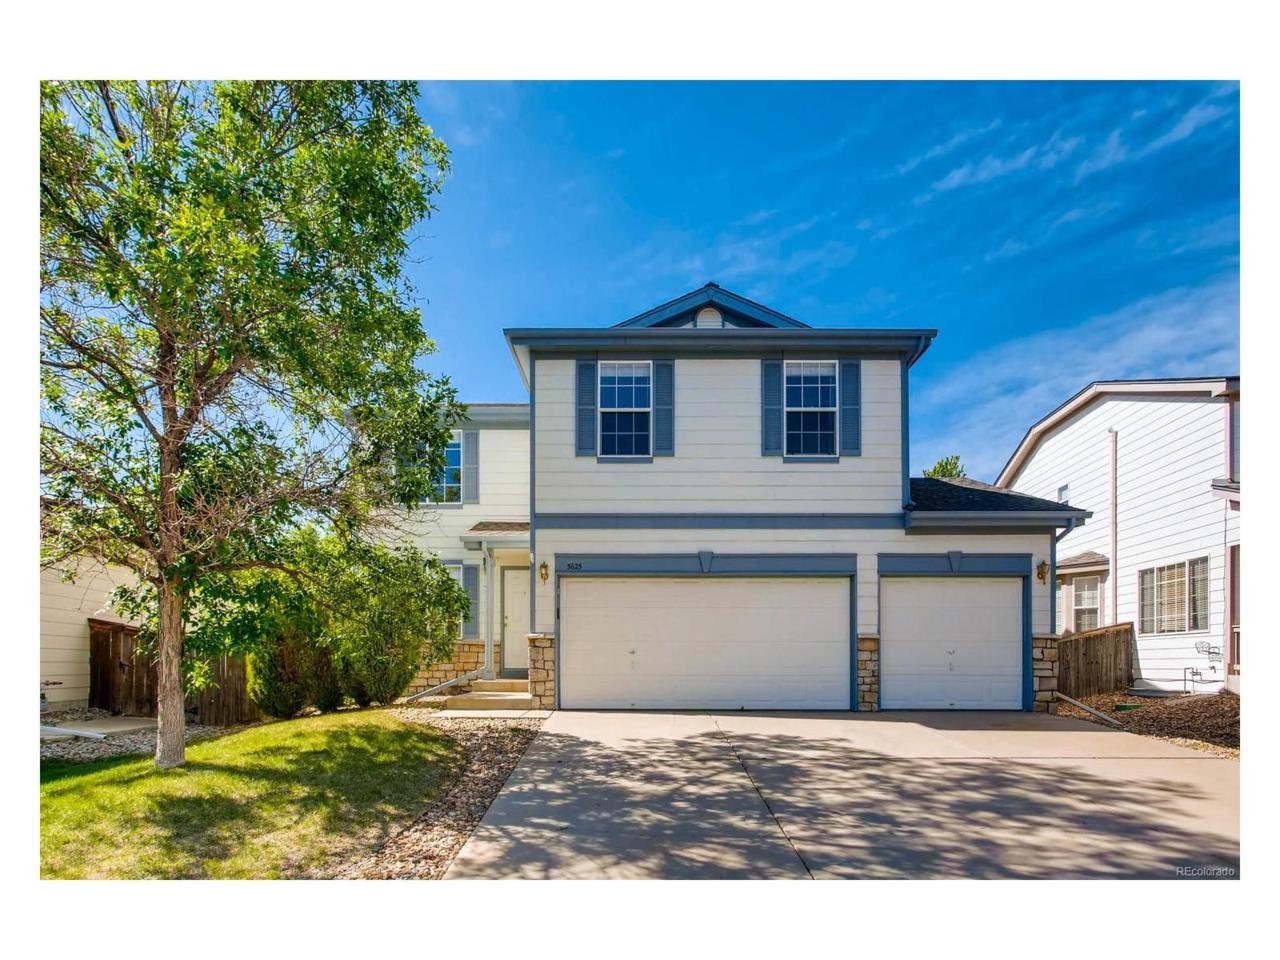 5625 Cheetah Chase, Littleton, CO 80124 (MLS #7387683) :: 8z Real Estate